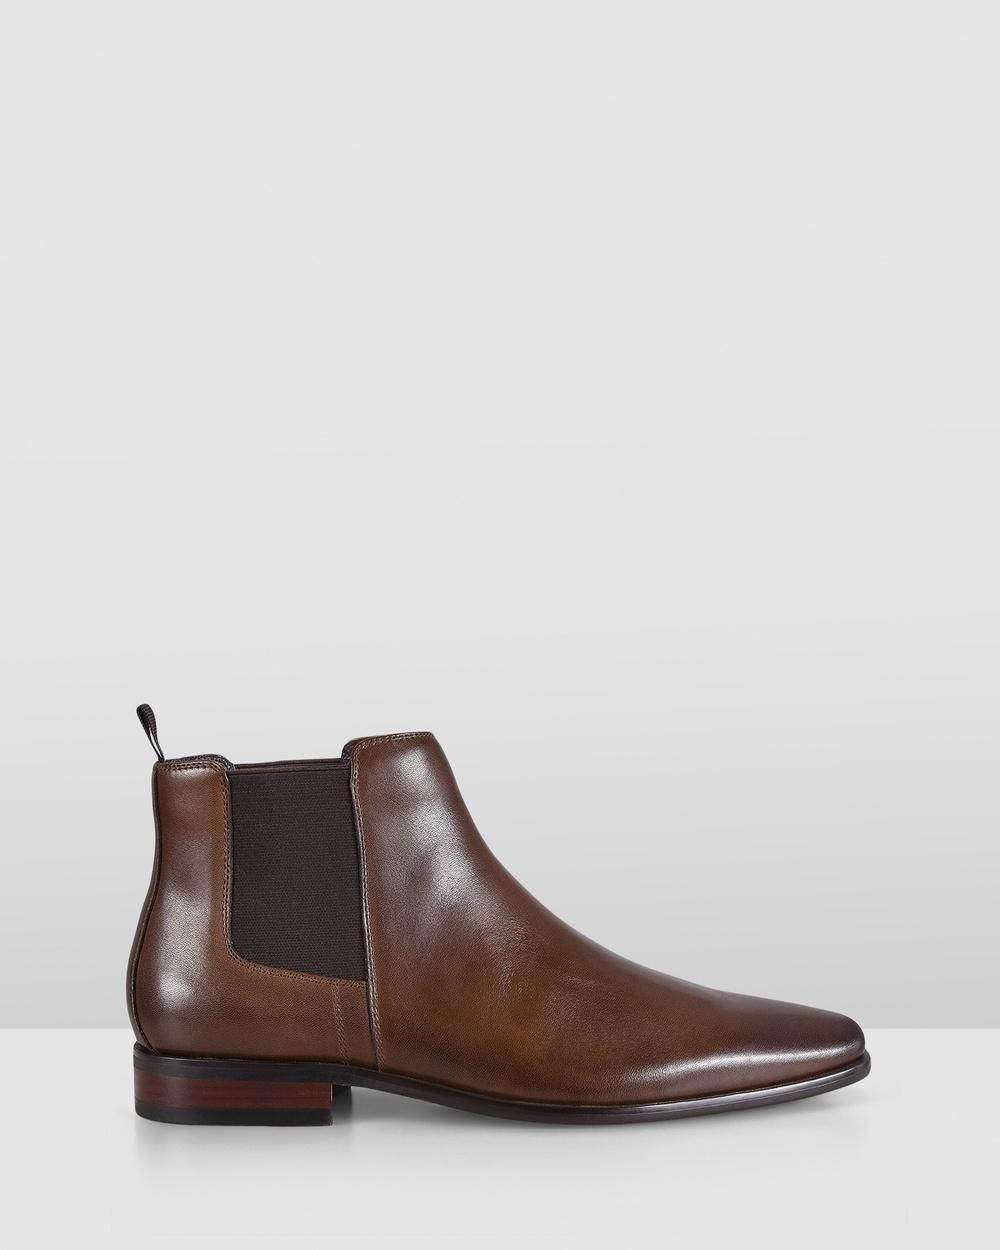 Julius Marlow Impart Boots Brown